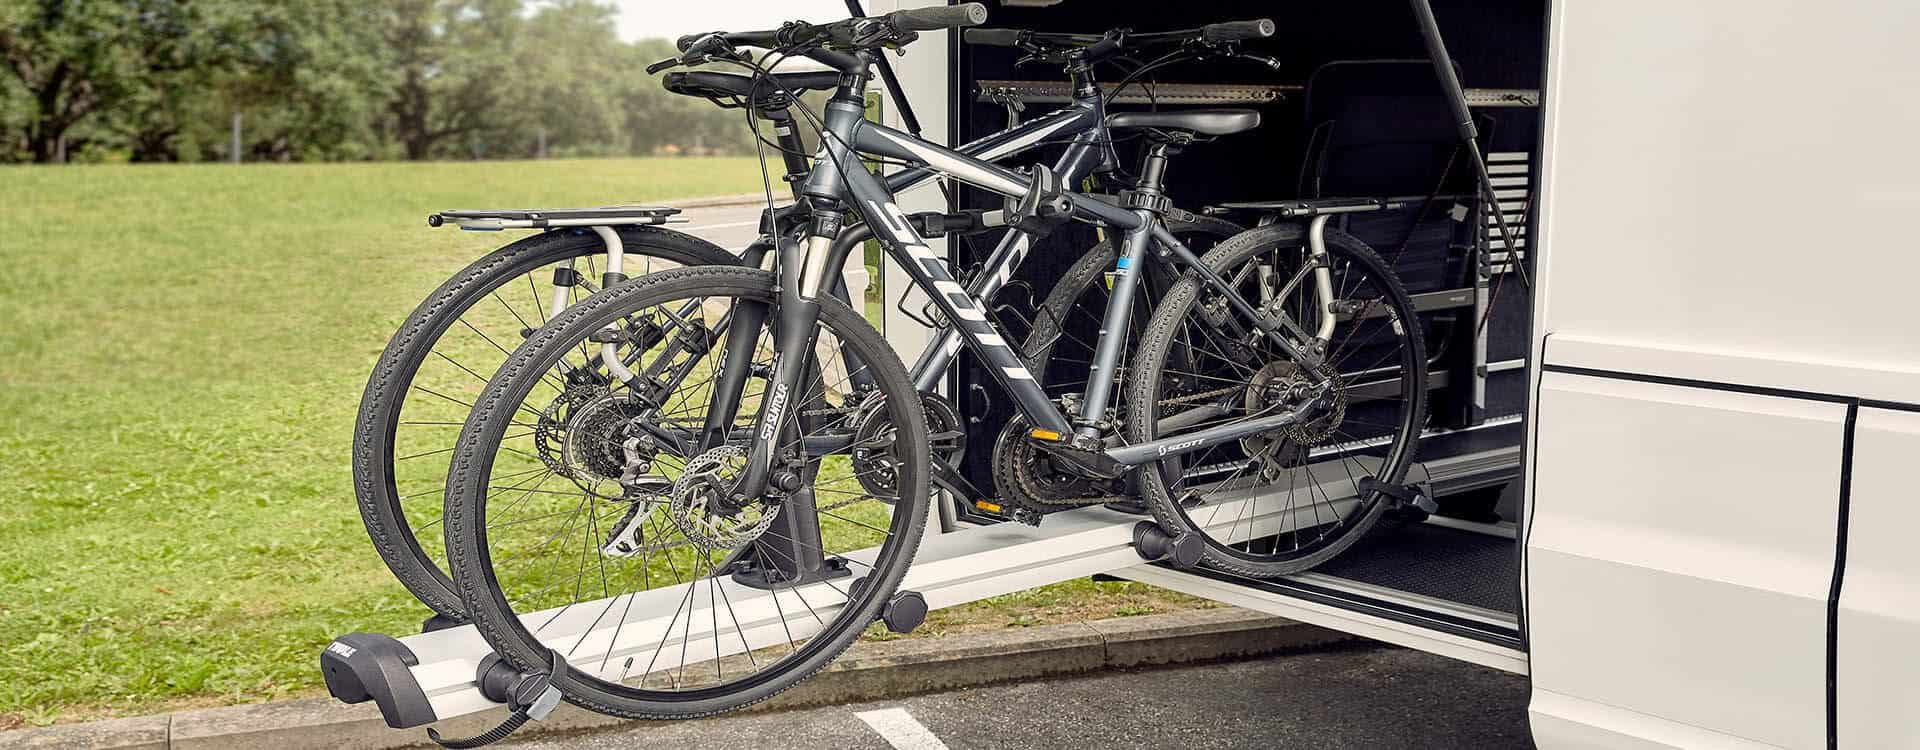 thule velospace garage bike rack